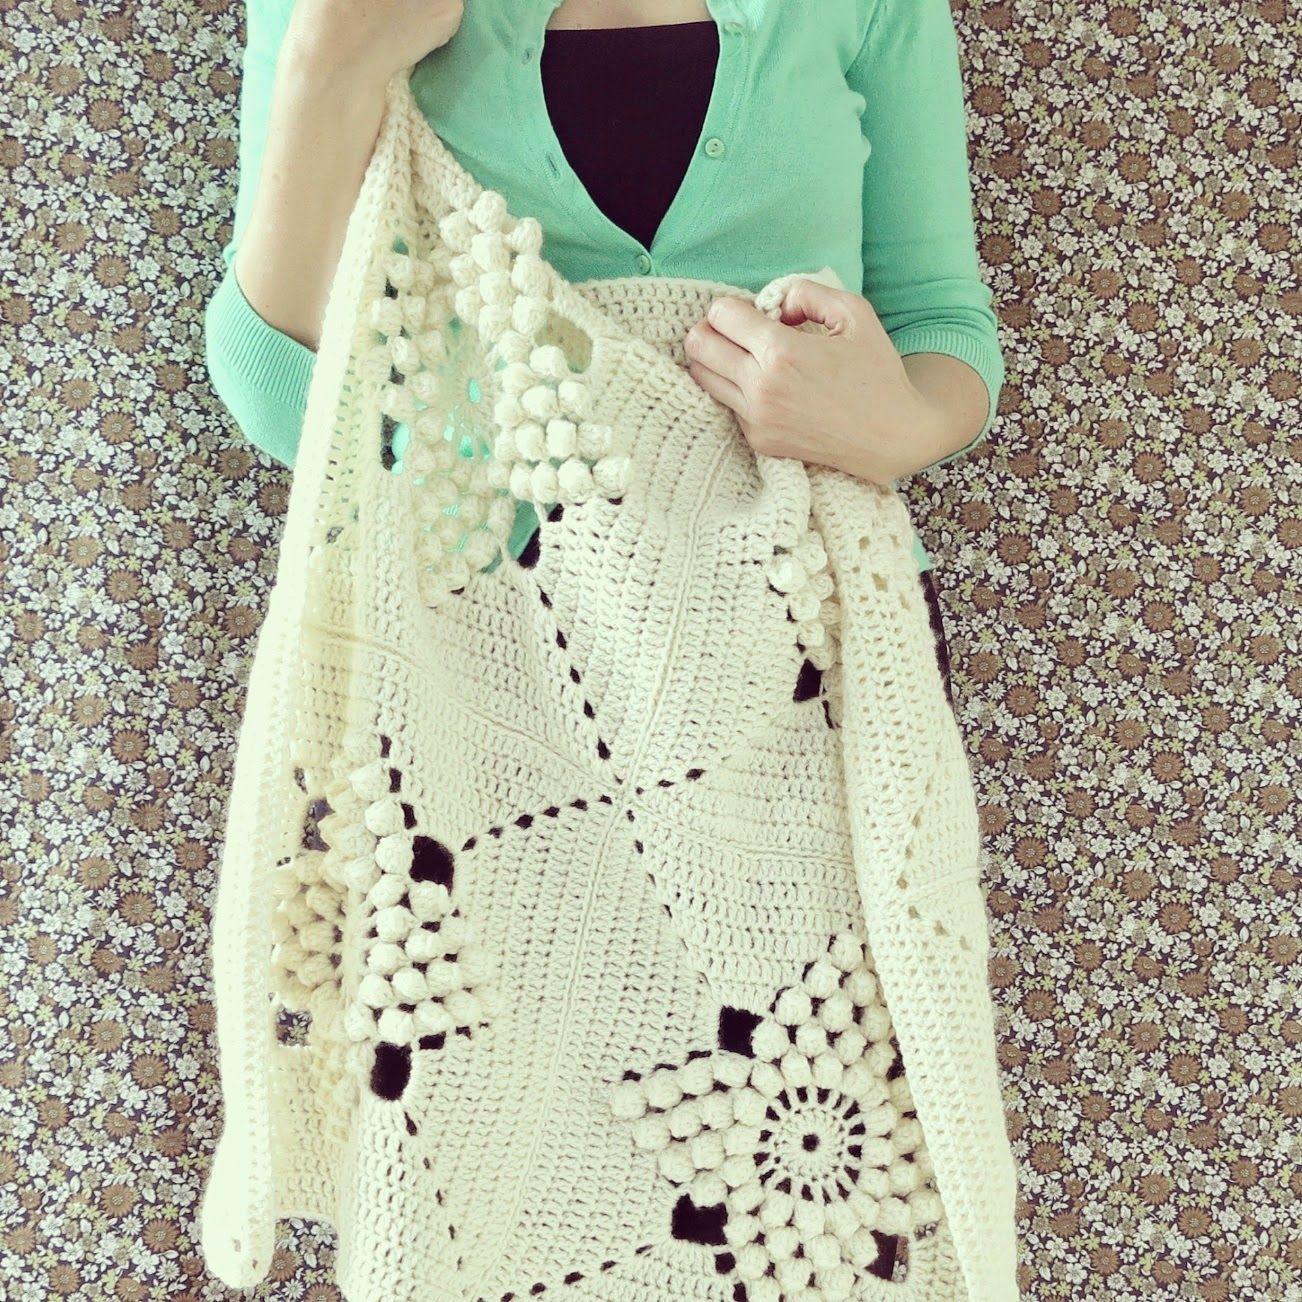 Byhaafner Crochet Smitten Blanket Vintage Pattern Popcorn